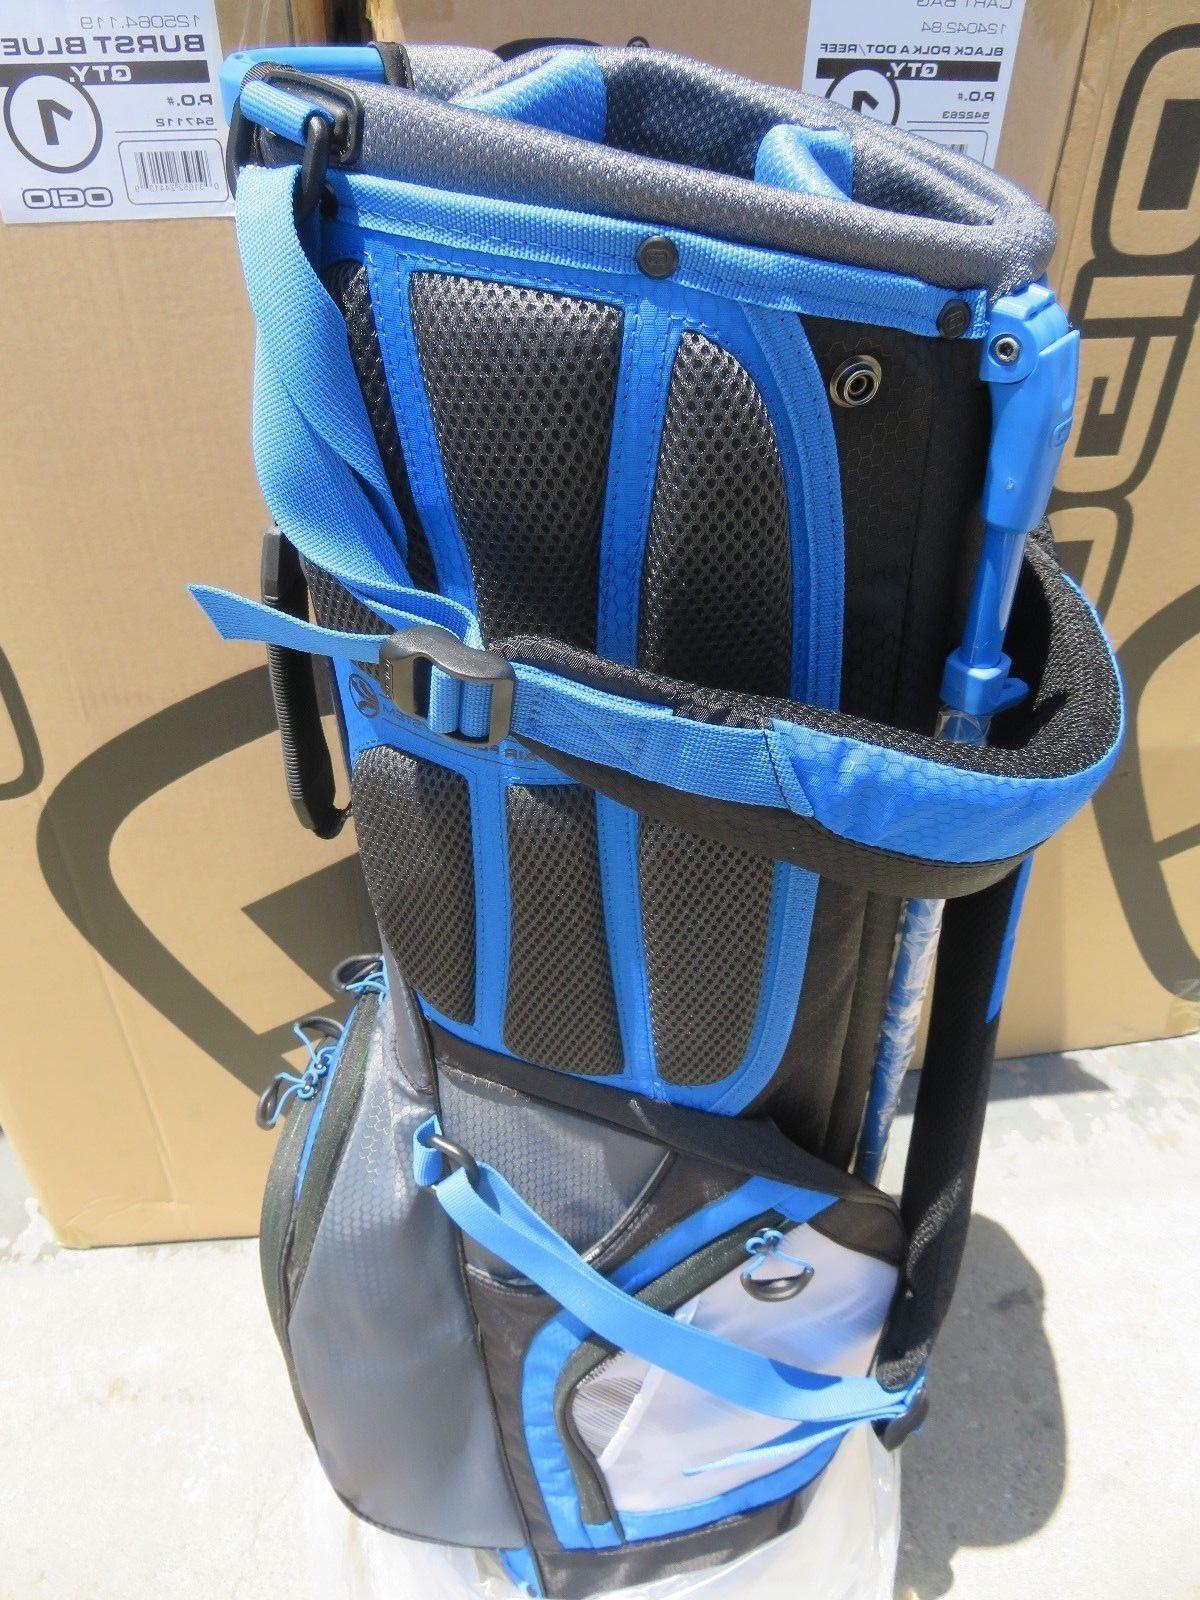 NEW 2018 BURST Divider Carry Bag